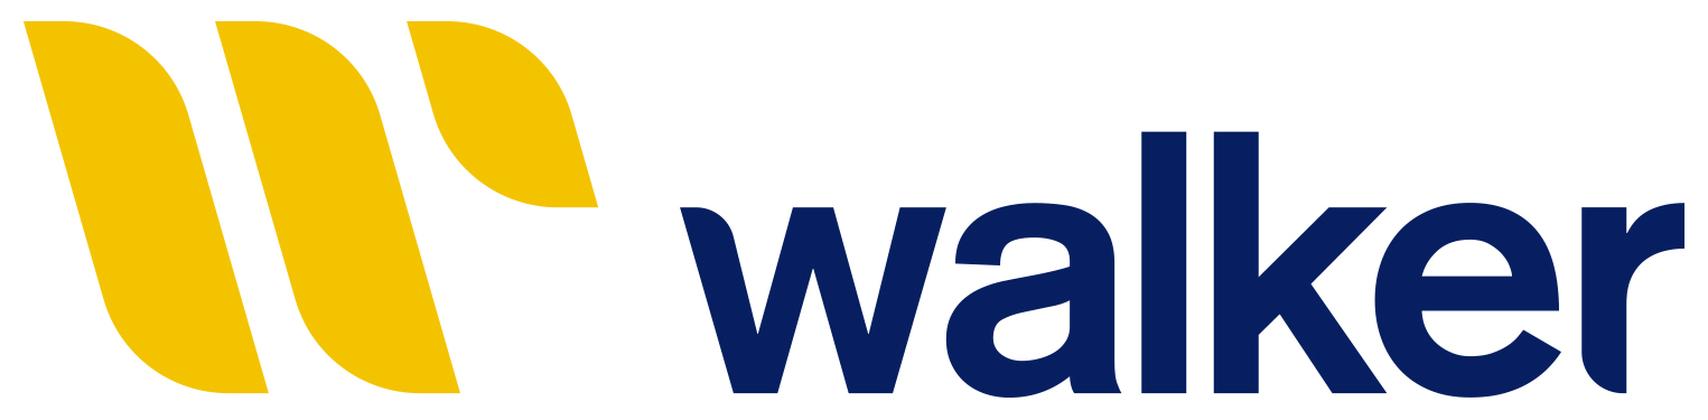 Walker Aggregates logo